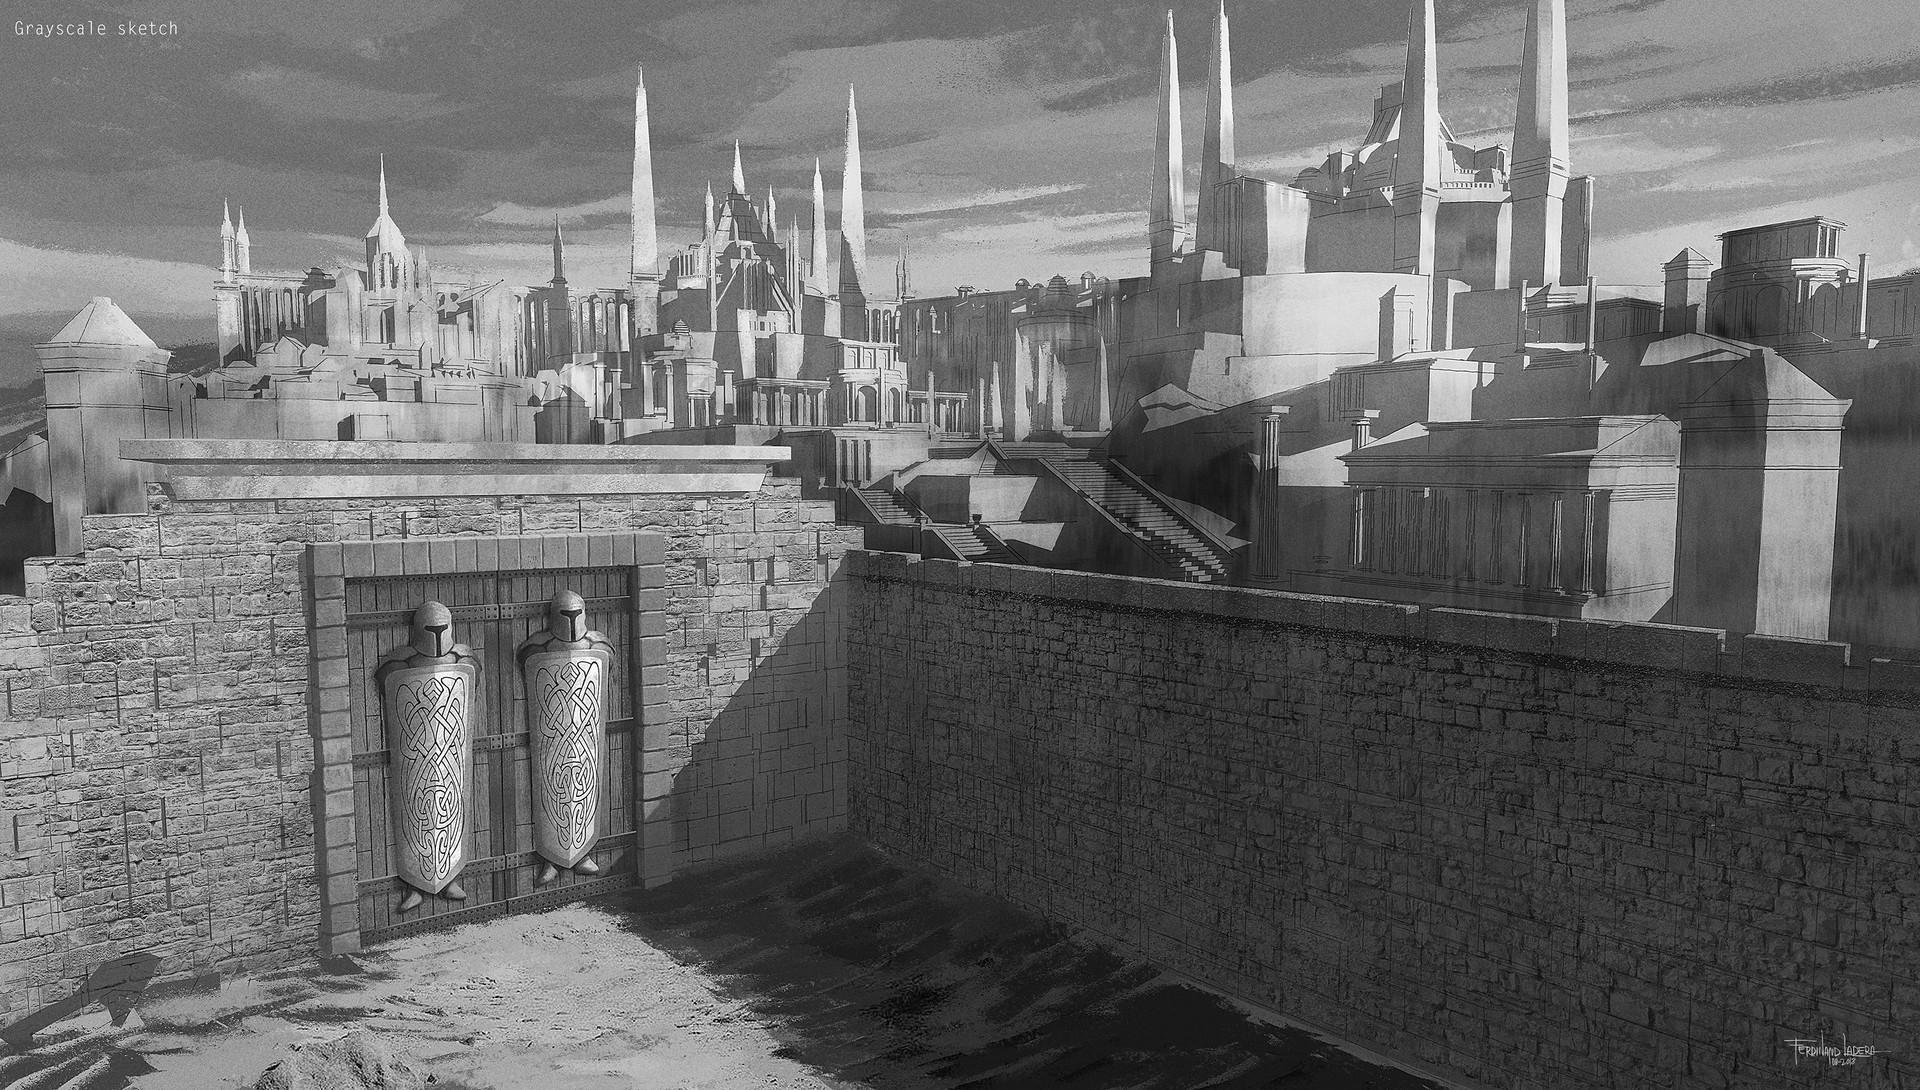 Ferdinand ladera gath ancient city bnw